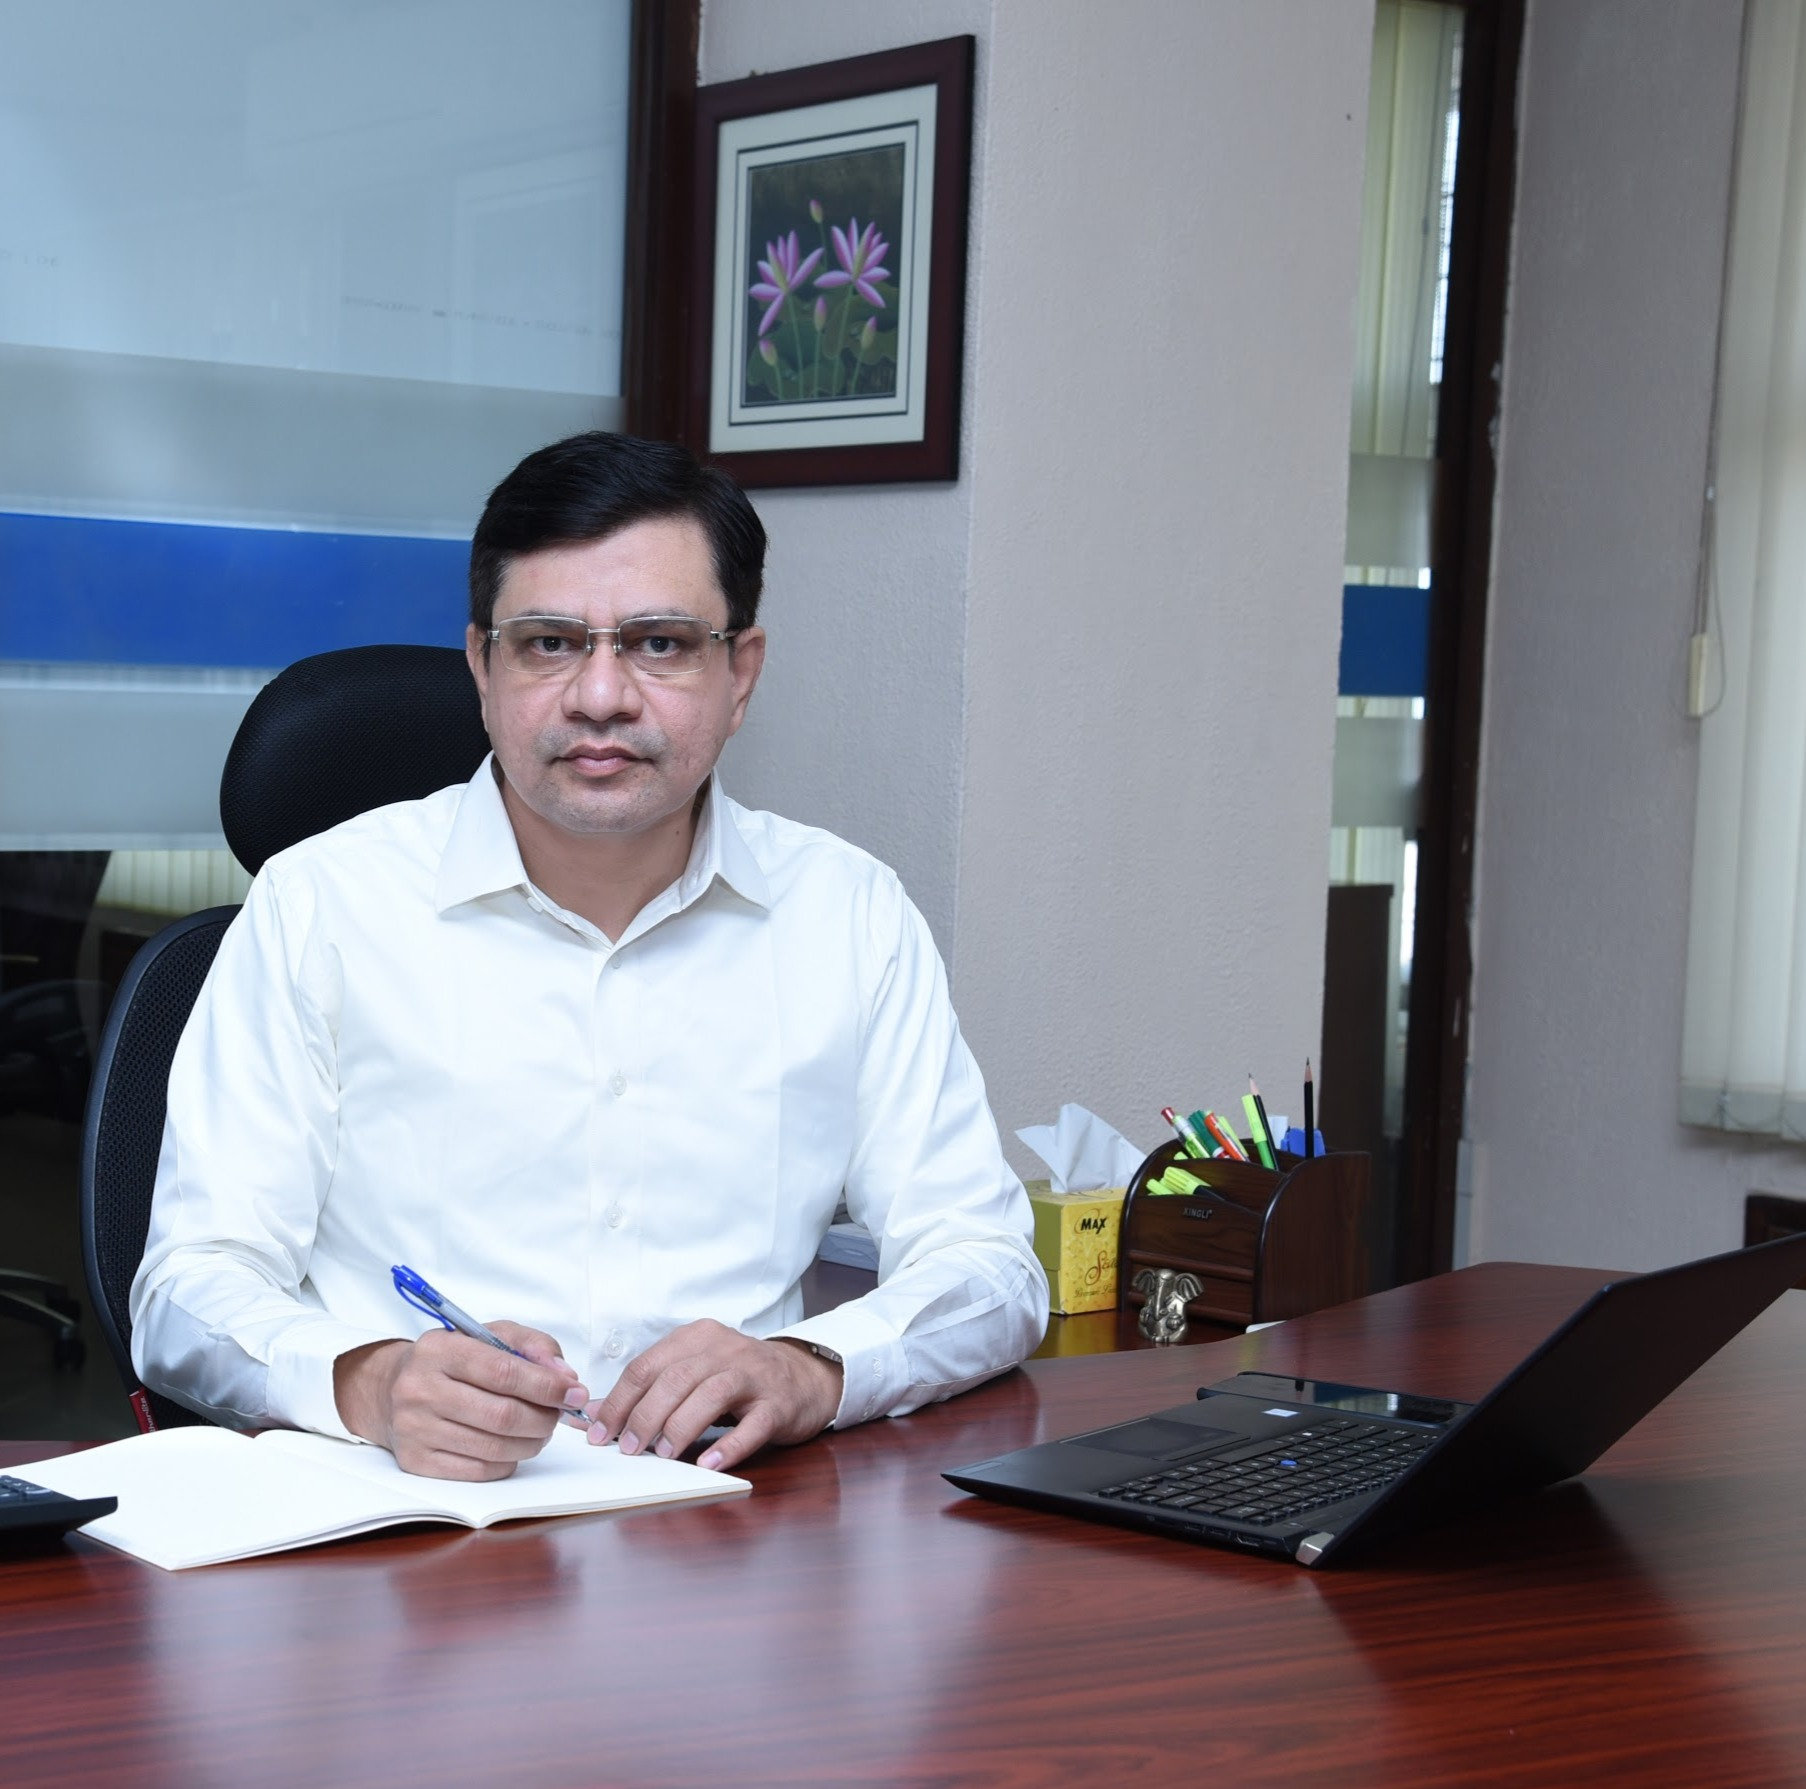 Mr. Ashwini Vaishnaw